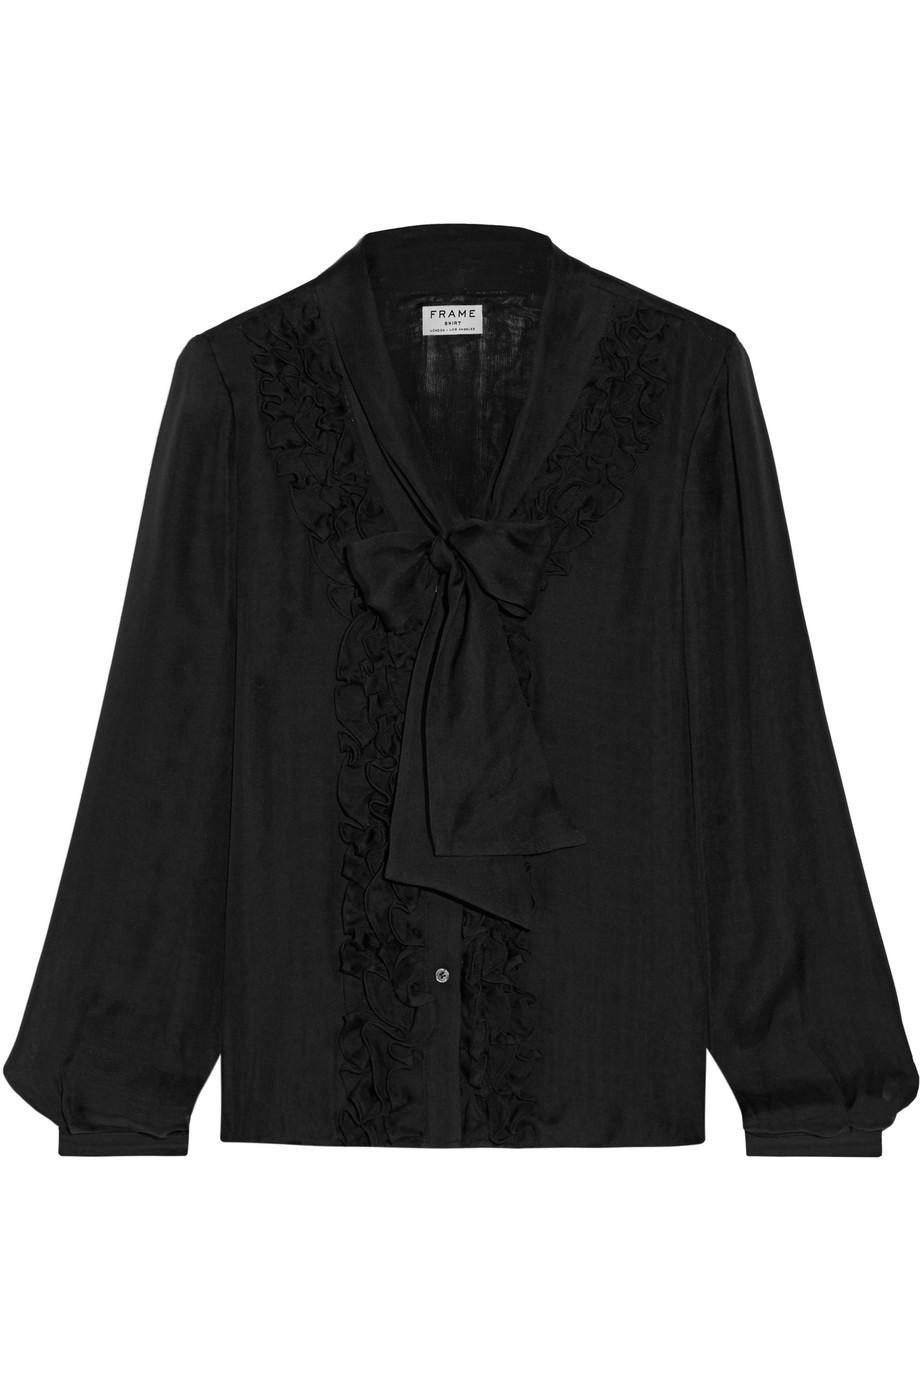 Frame Denim Le Ruffle Pussy-Bow Silk Shirt, Black, Women's